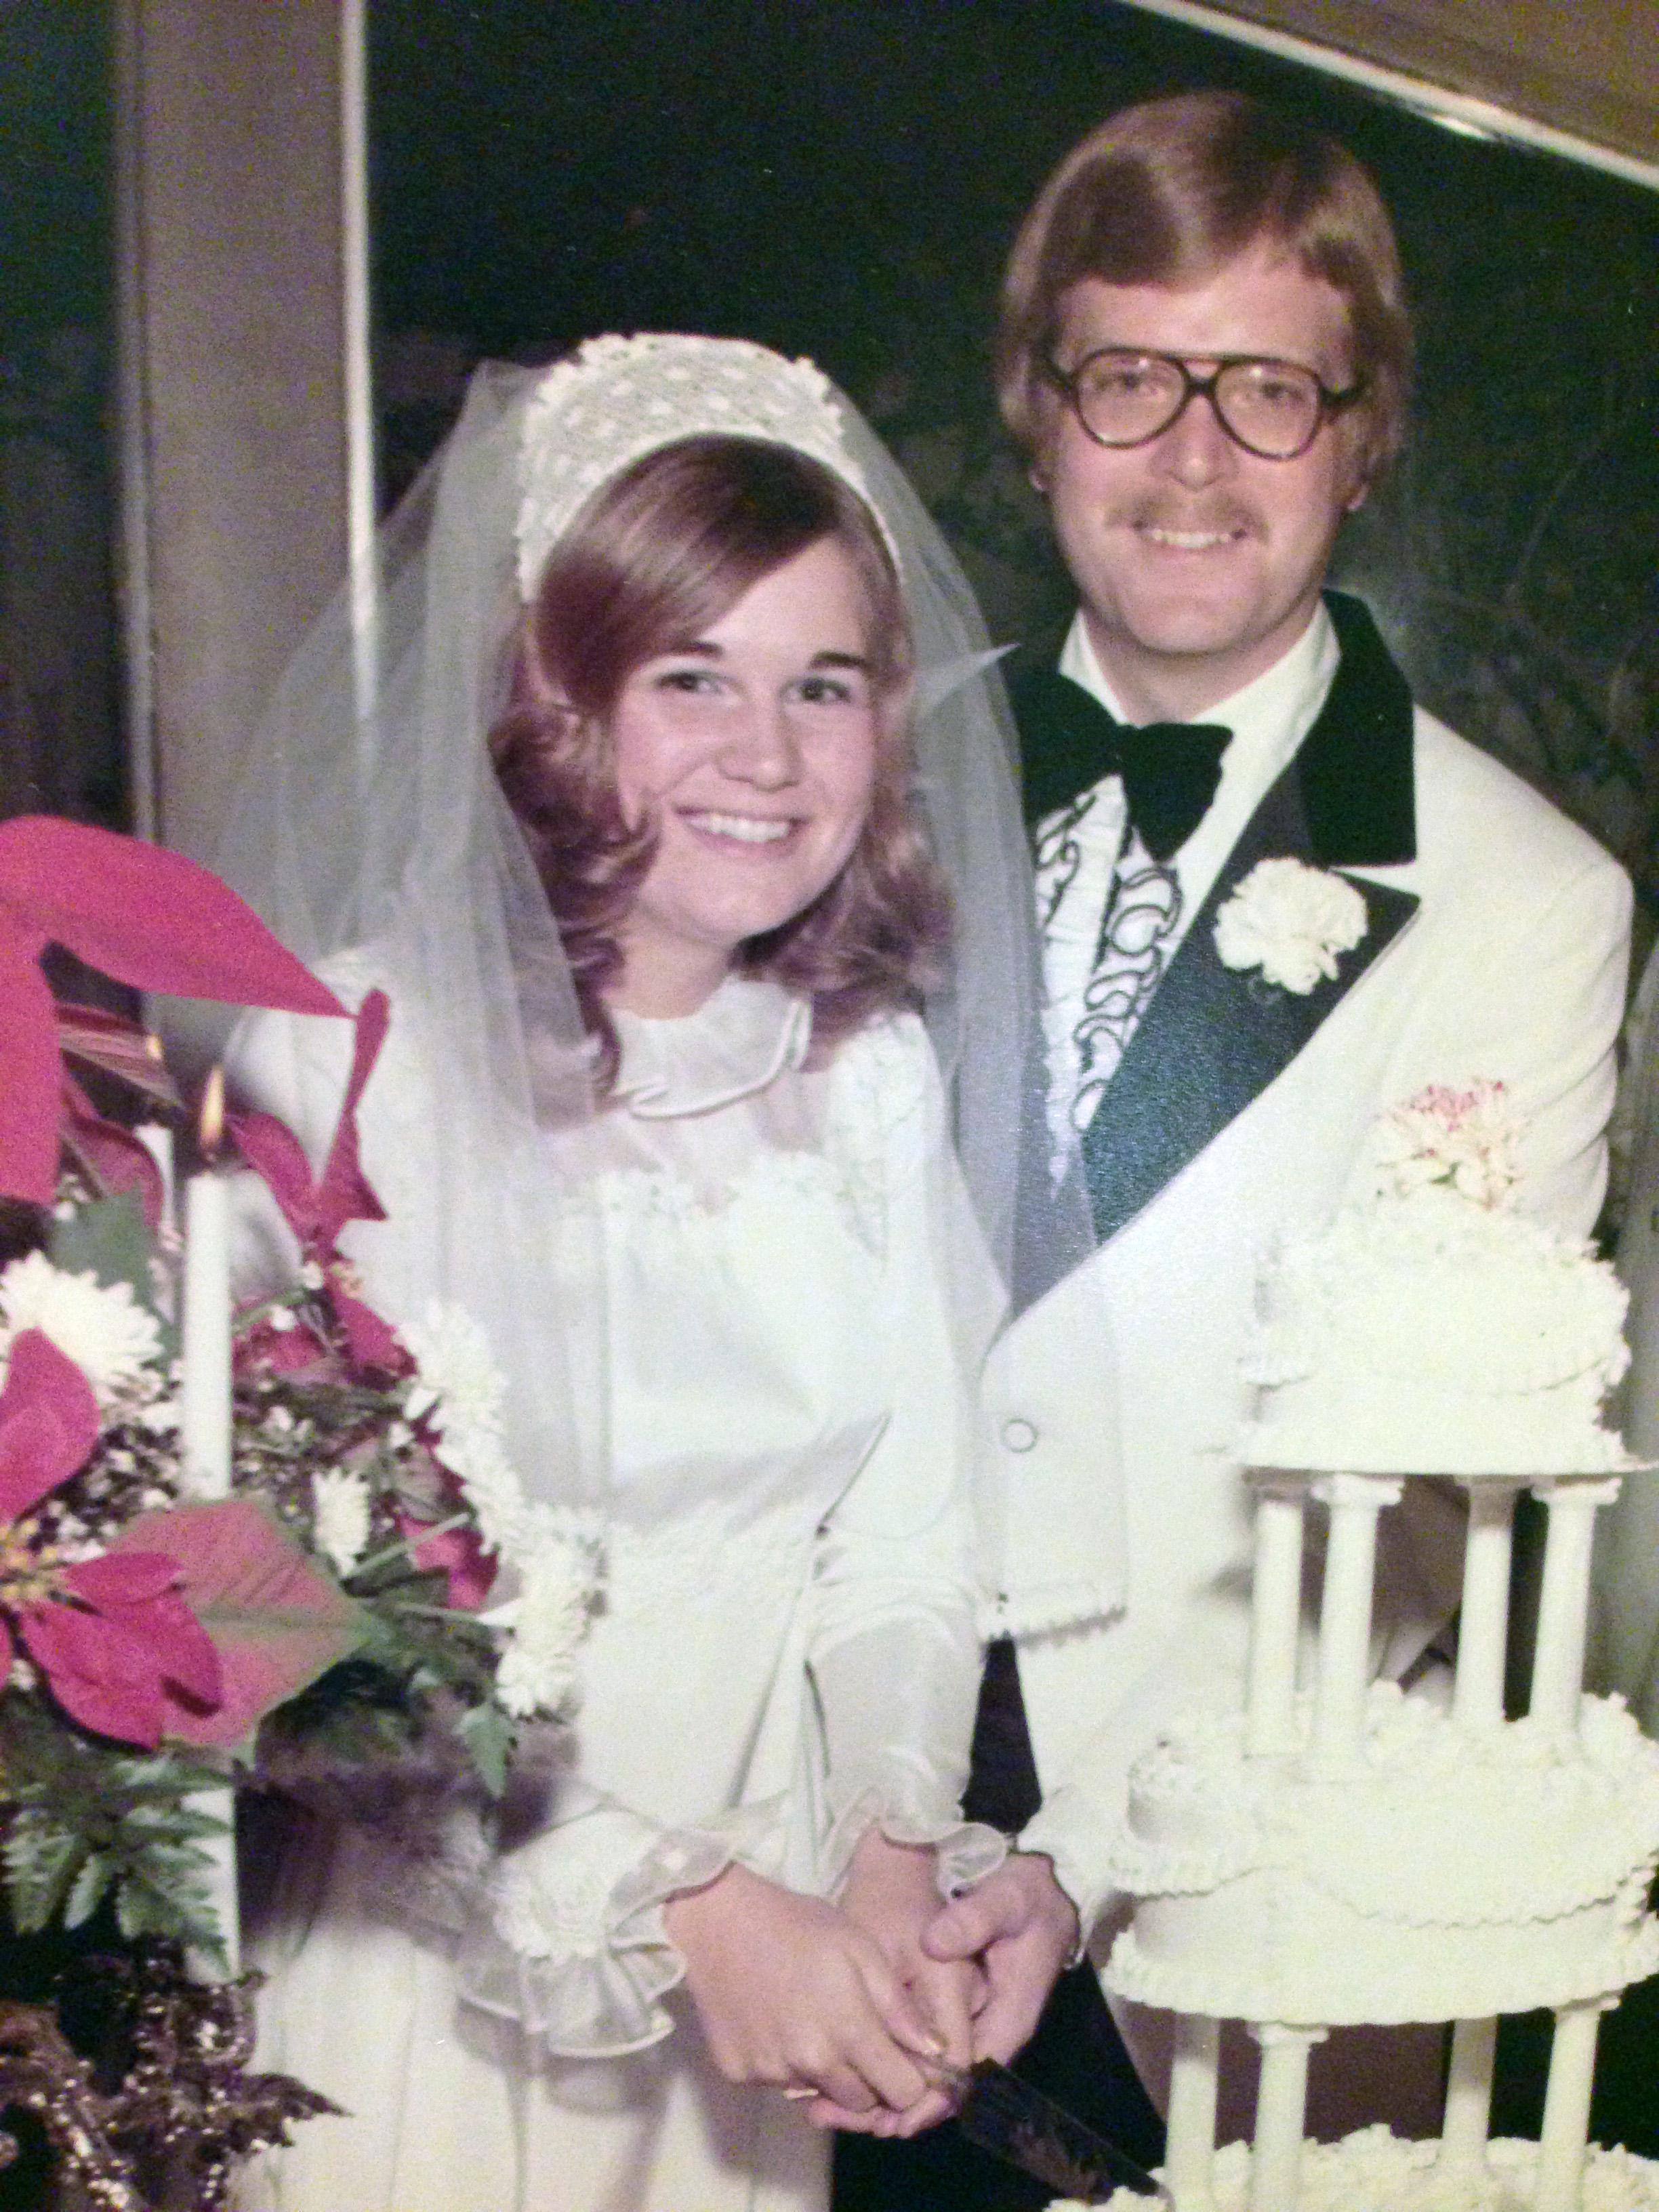 Candy Moser Hagan and Mike Hagan wedding.jpg